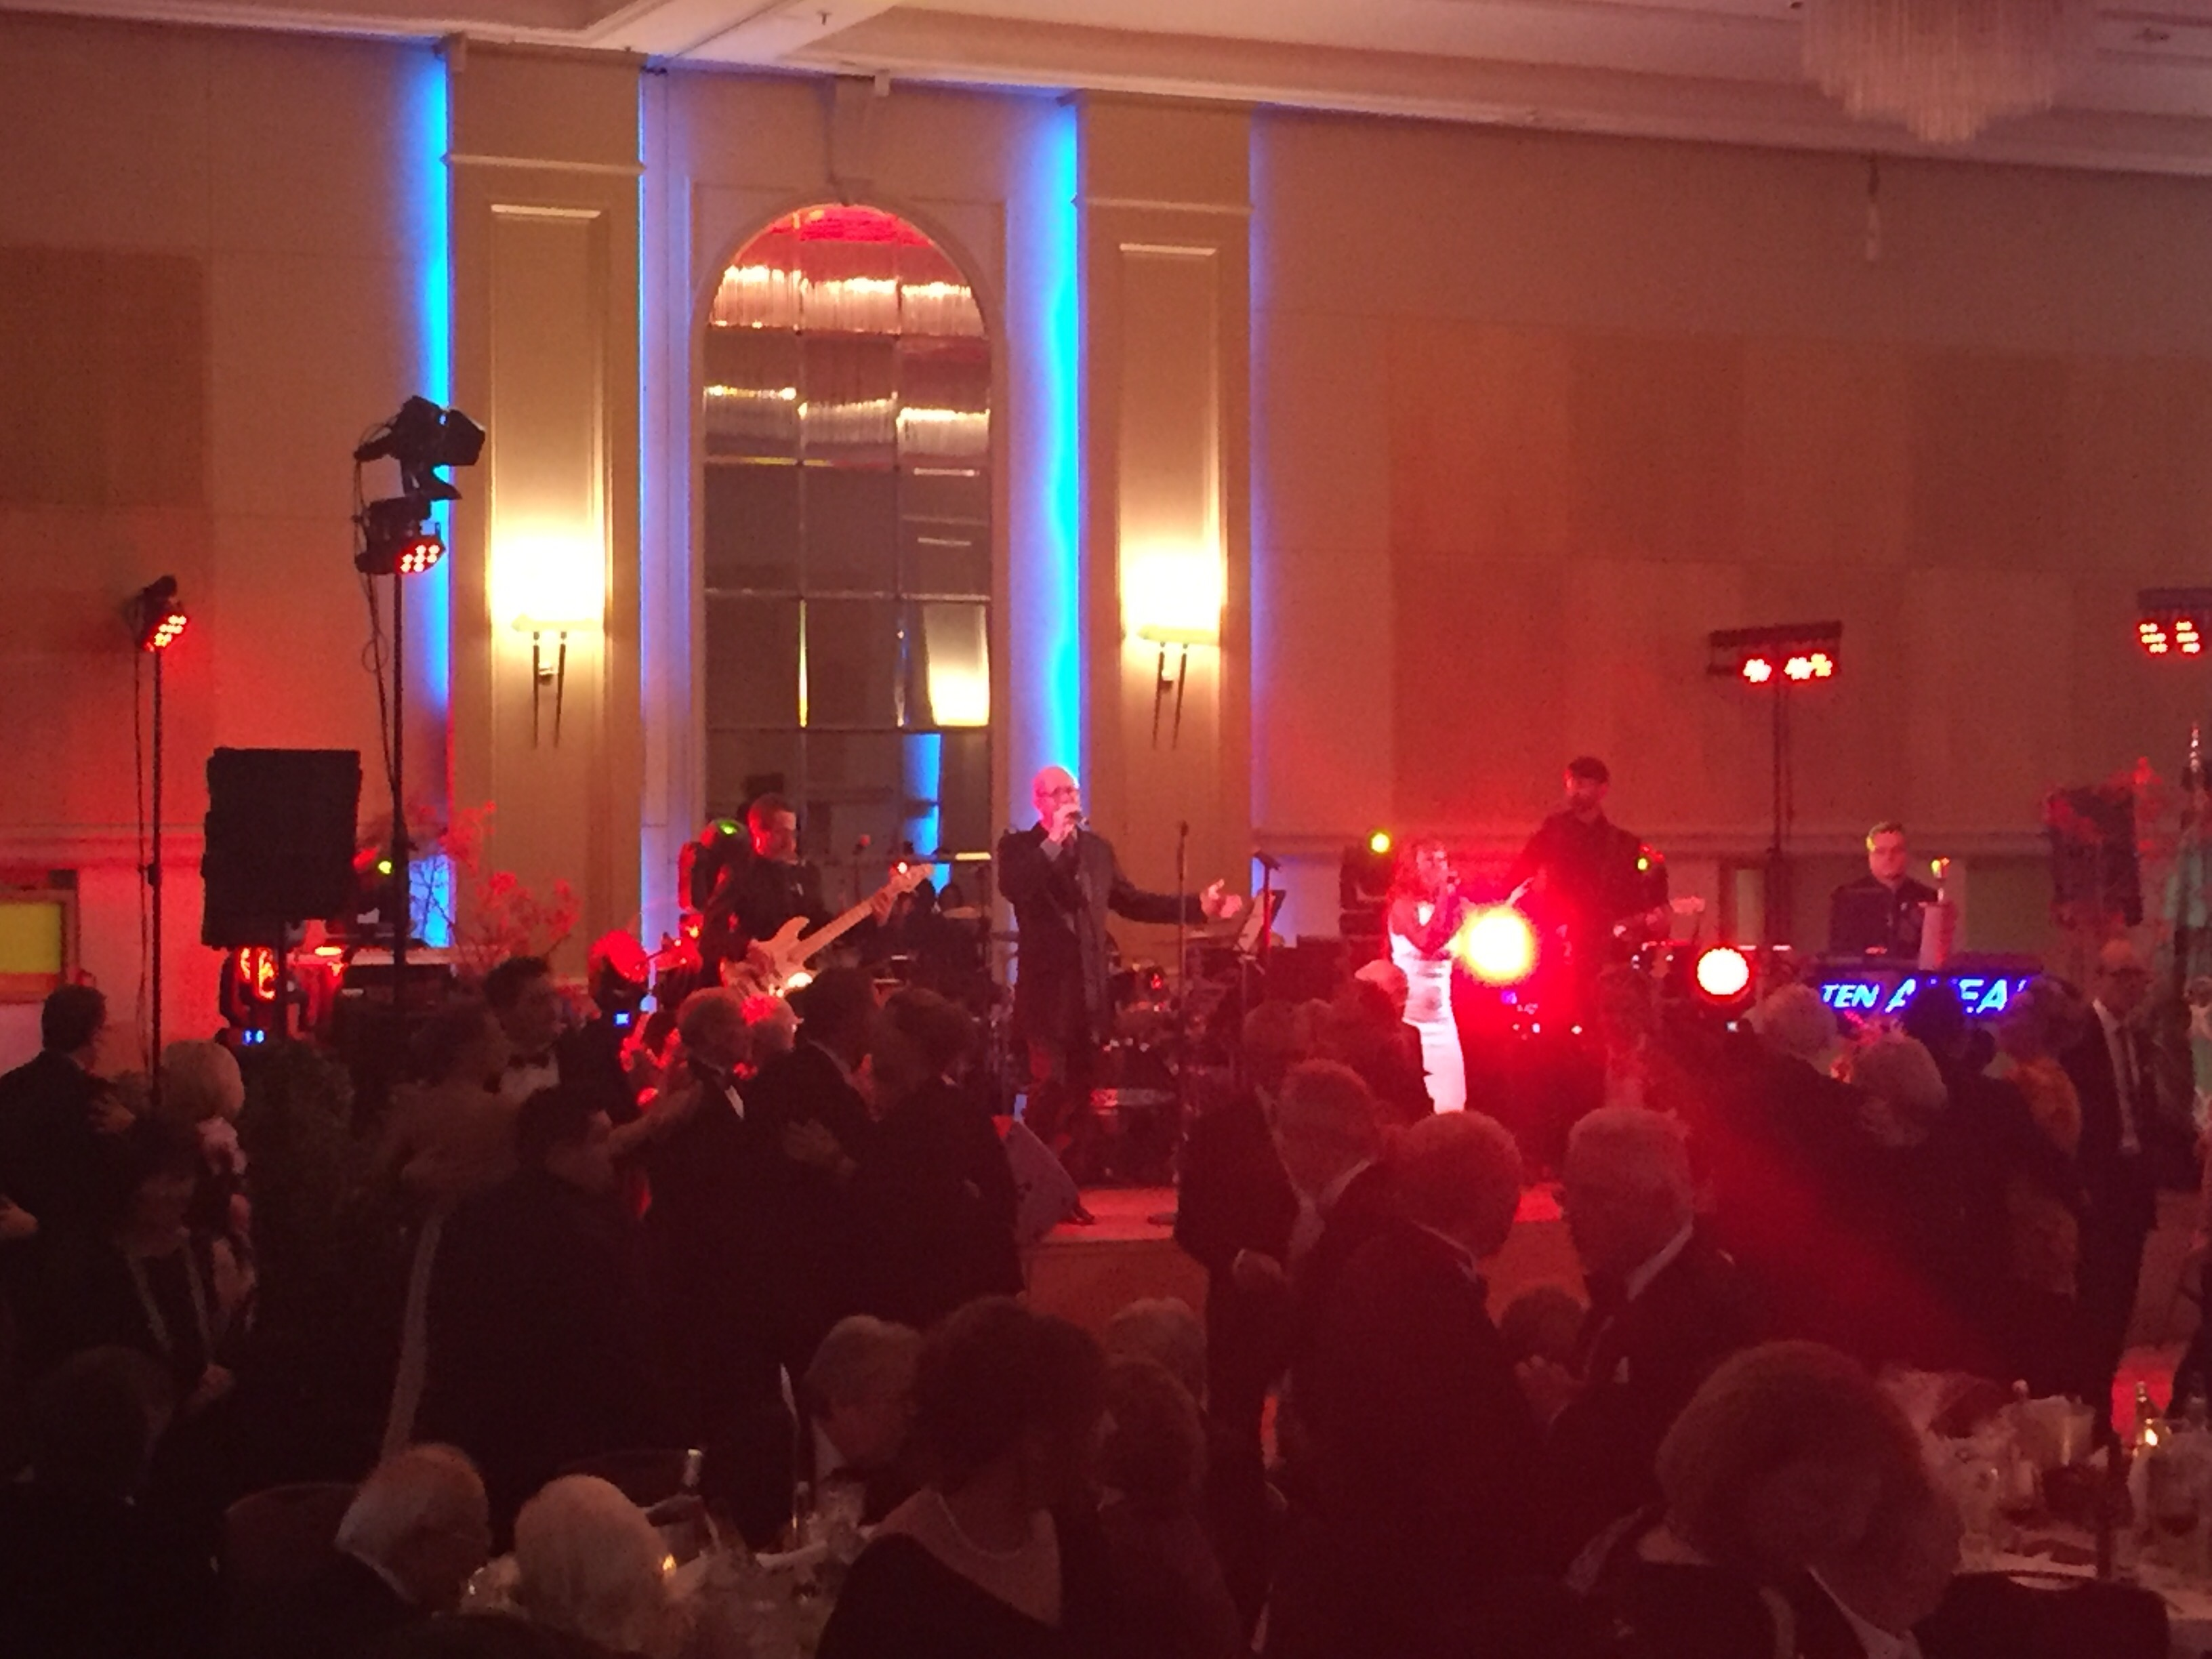 Liveband Düsseldorf, Partyband Köln, Showband NRW, Hilton Hotel